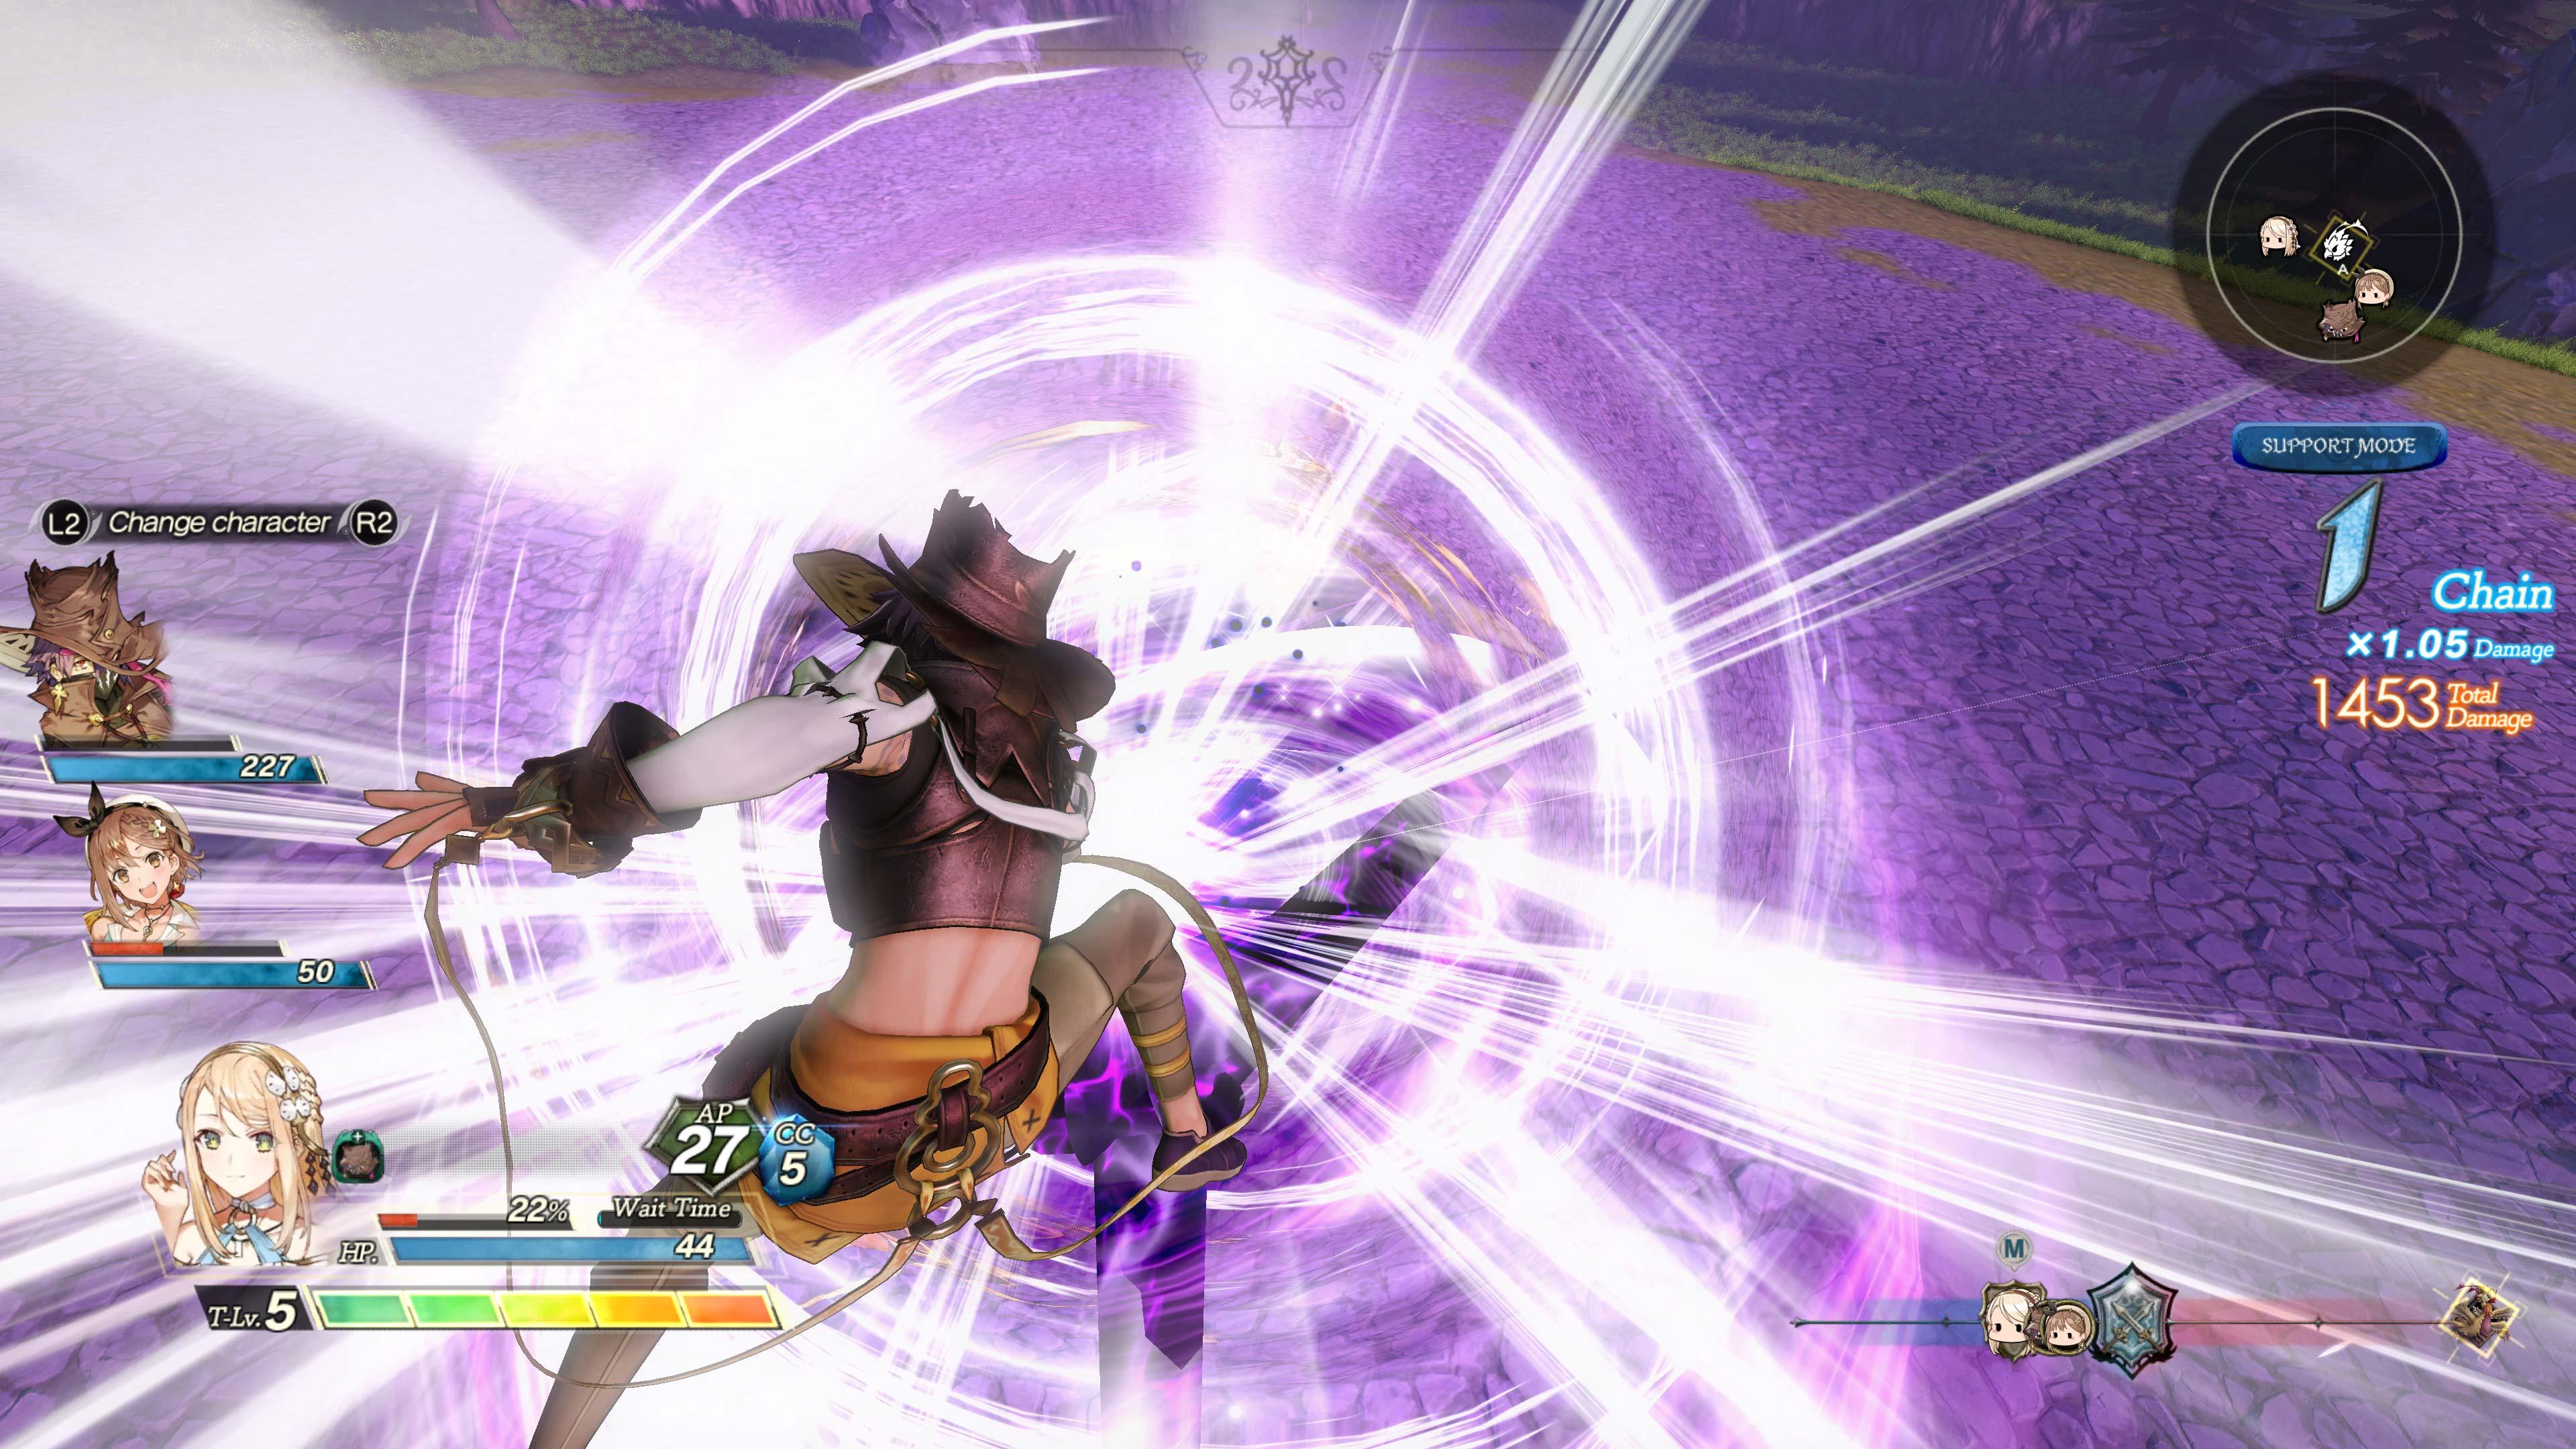 Геймплей [4K] - Atelier Ryza 2: Lost Legends & the Secret Fairy